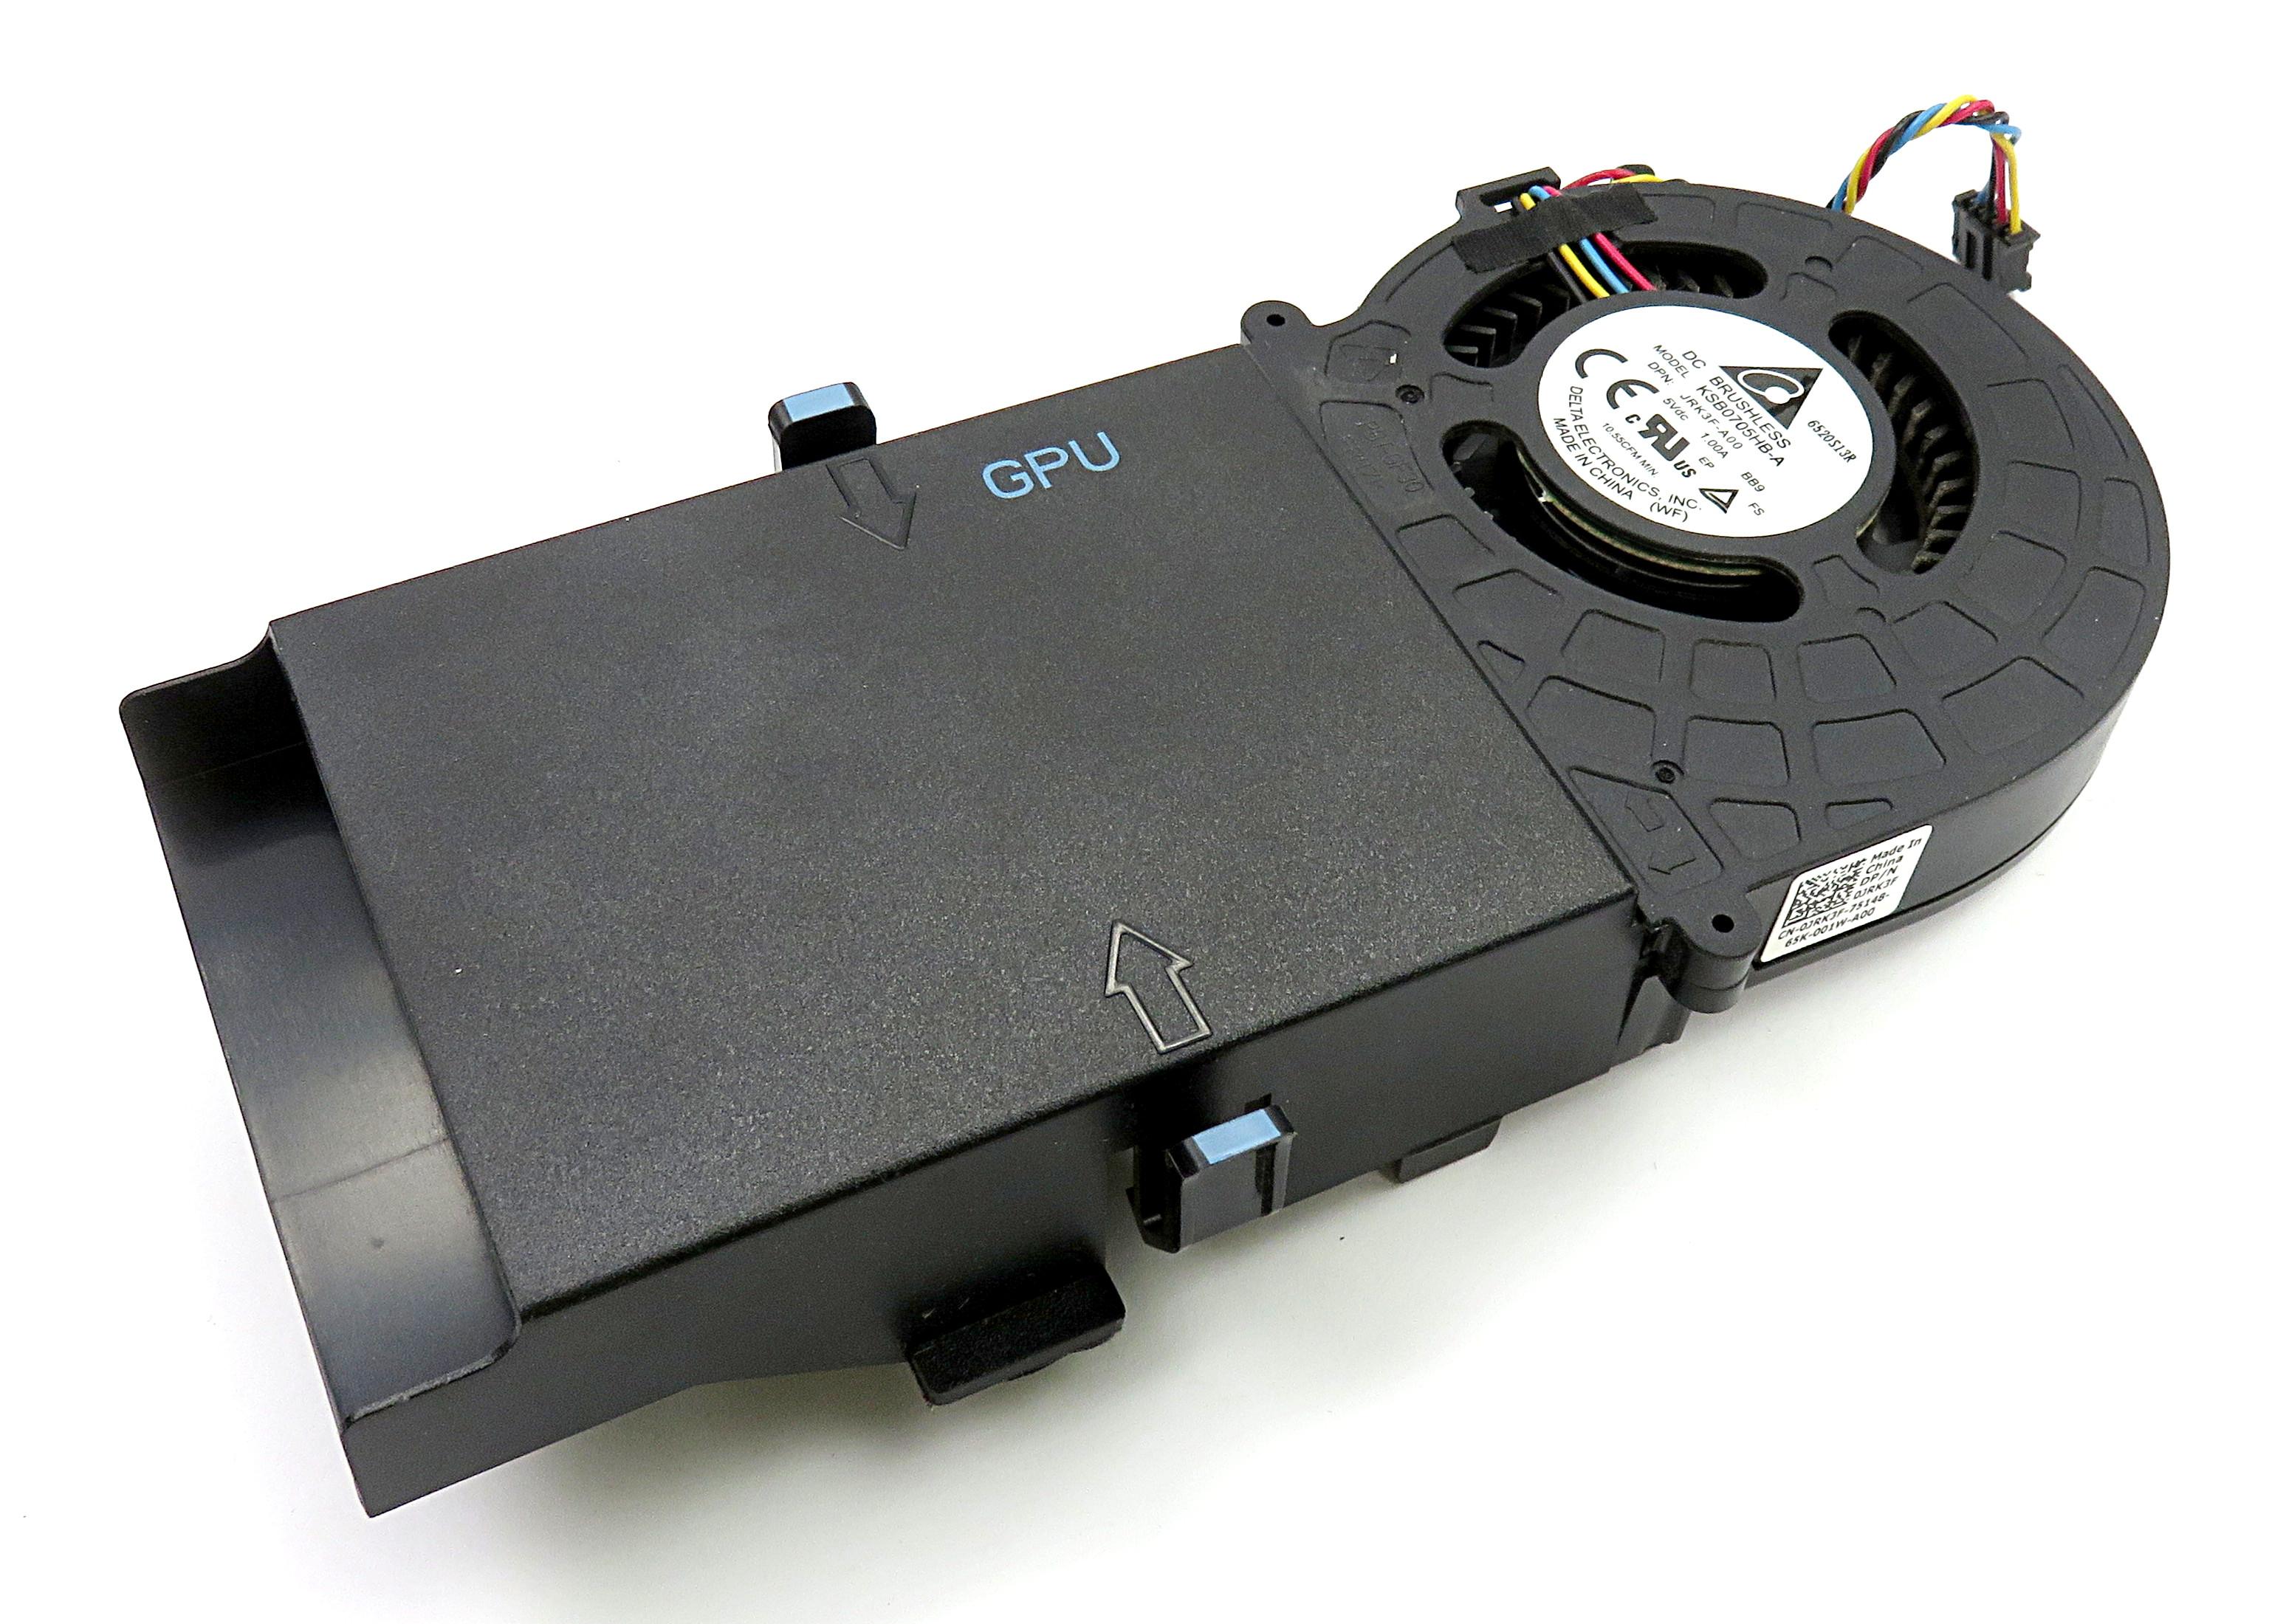 Dell JRK3F GPU Shroud & Fan Cooling Assembly f/ Alienware Alpha D07U Gaming PC